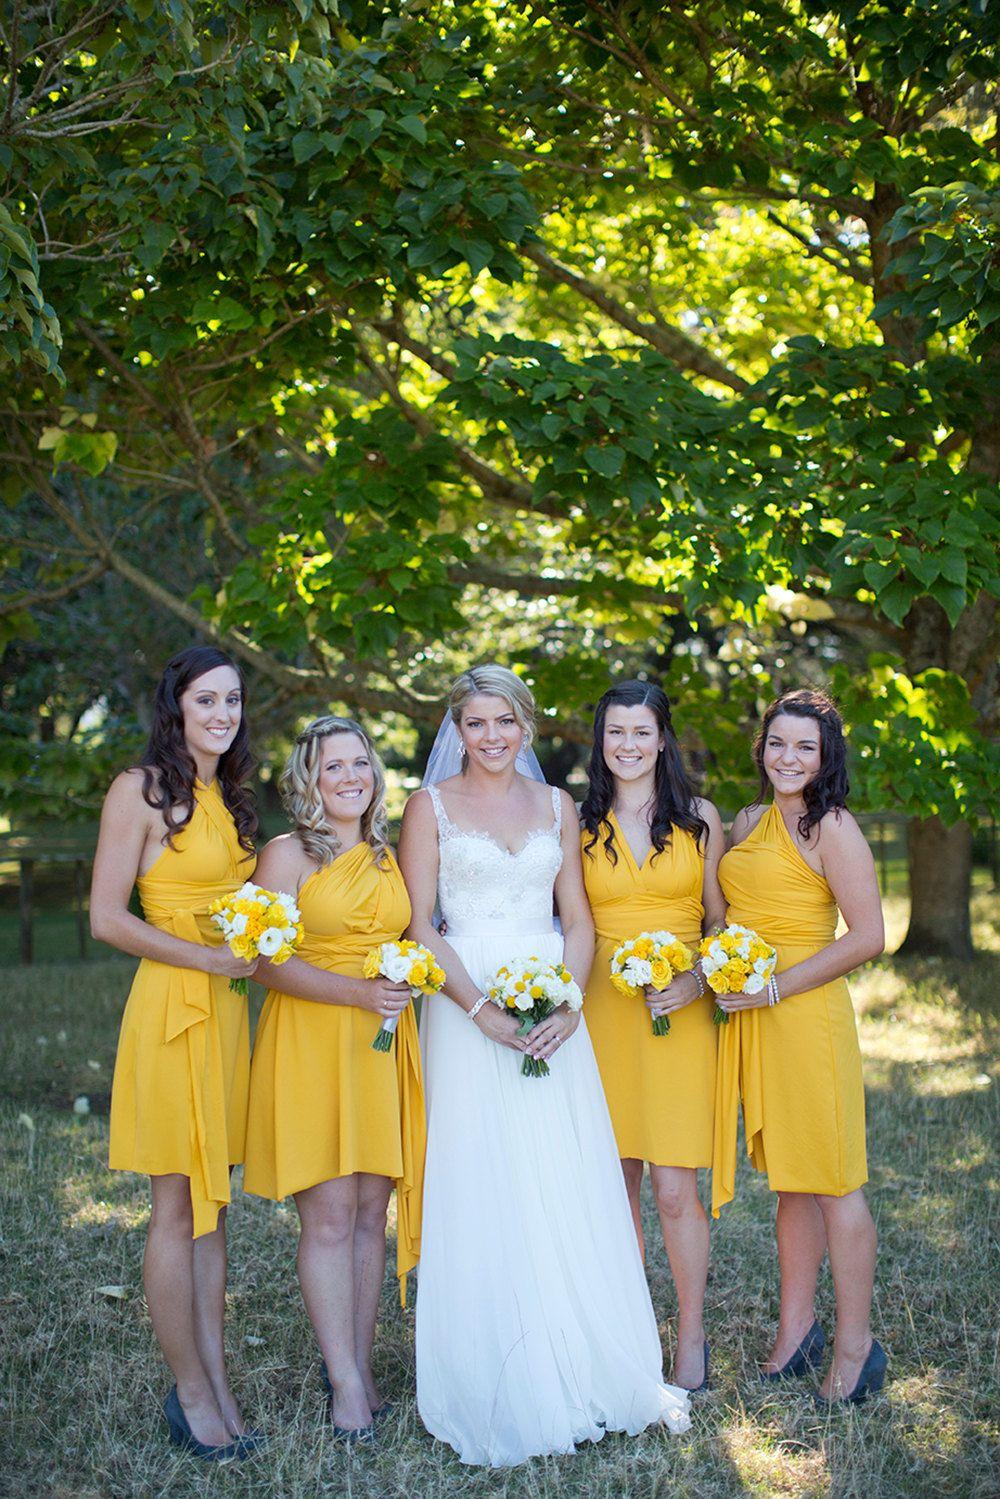 Golden yellow bridesmaids convertible wrap twist knee by staysilee golden yellow bridesmaids convertible wrap twist knee by staysilee ombrellifo Image collections